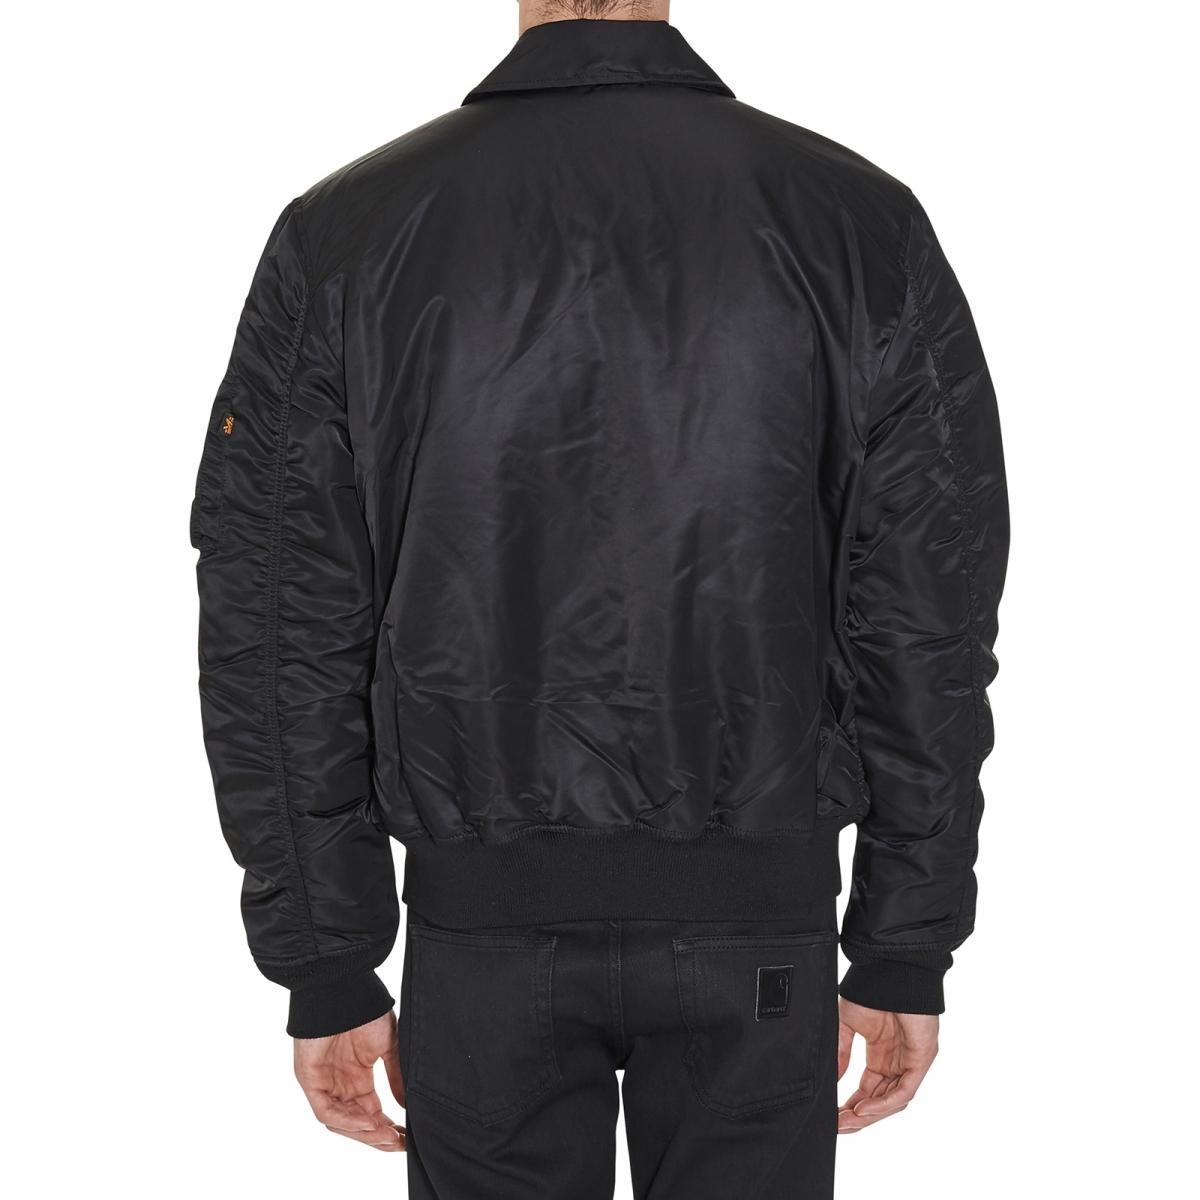 Alpha Industries Cwu 45 Bomber Jacket in Black for Men